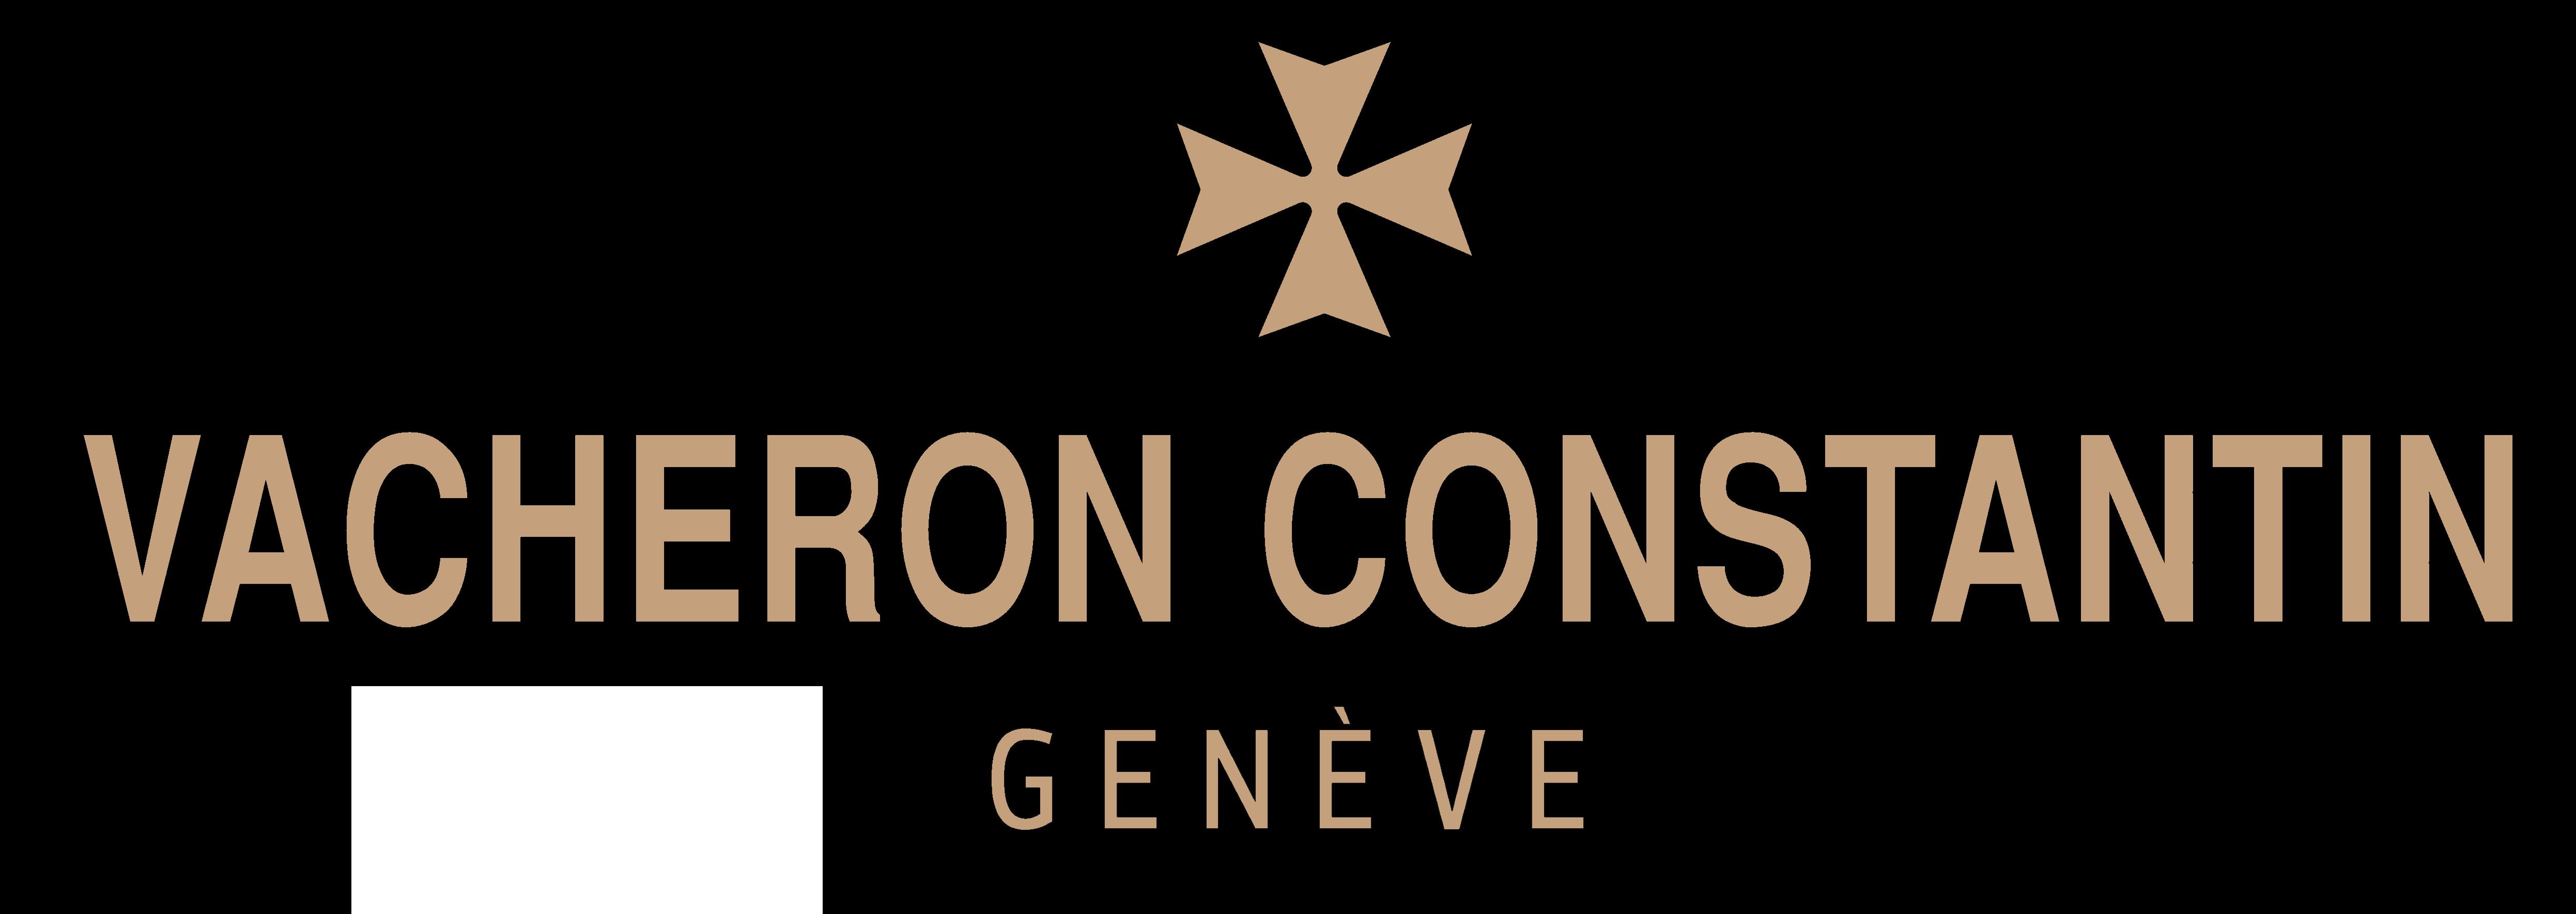 vacheron-constantin-logo-new-.png